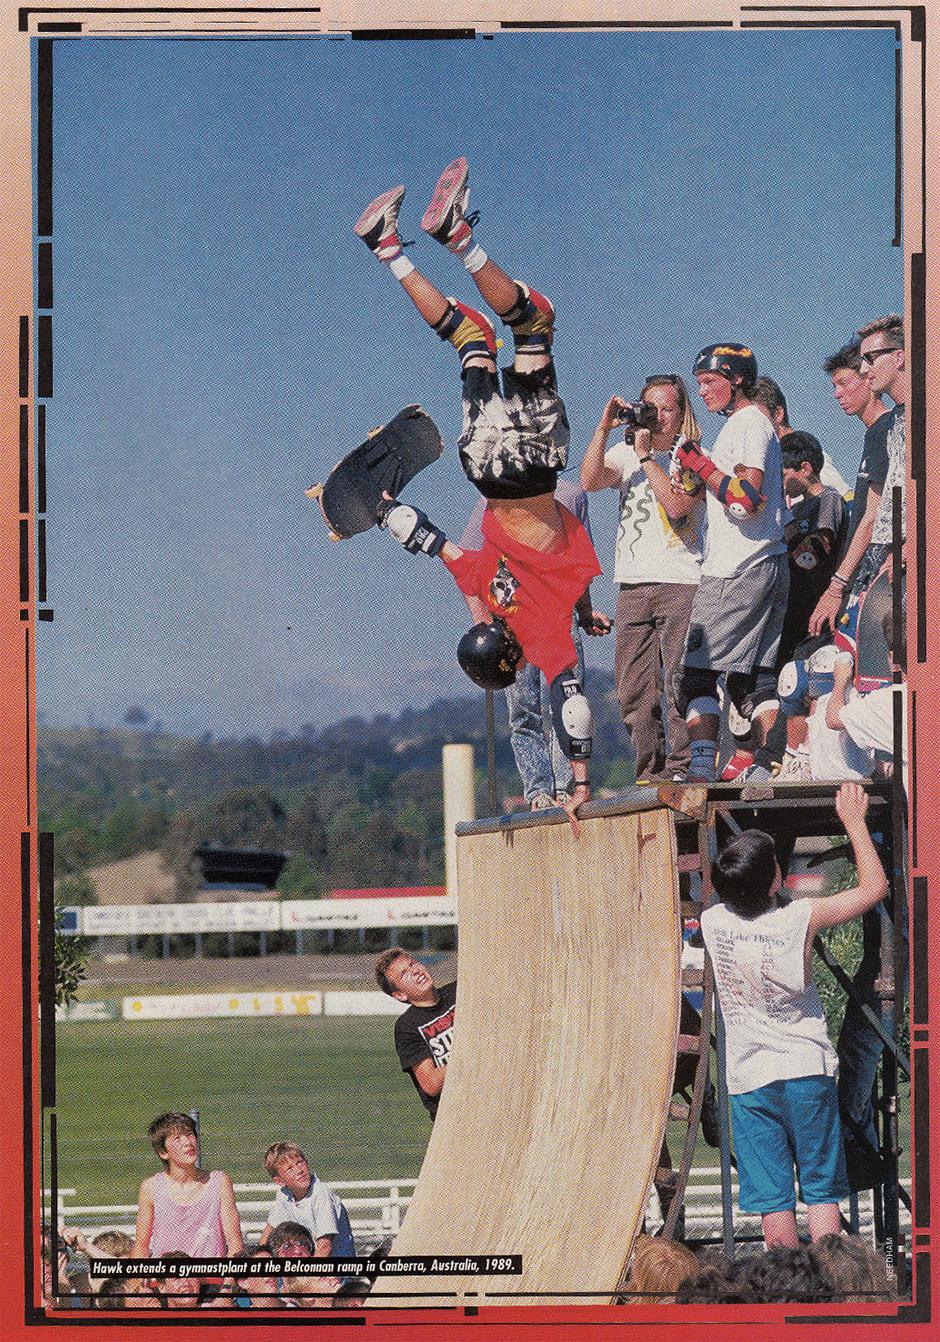 Gymnast Plant on Australian Capital Territory in 1989 Photo: Scott Needham